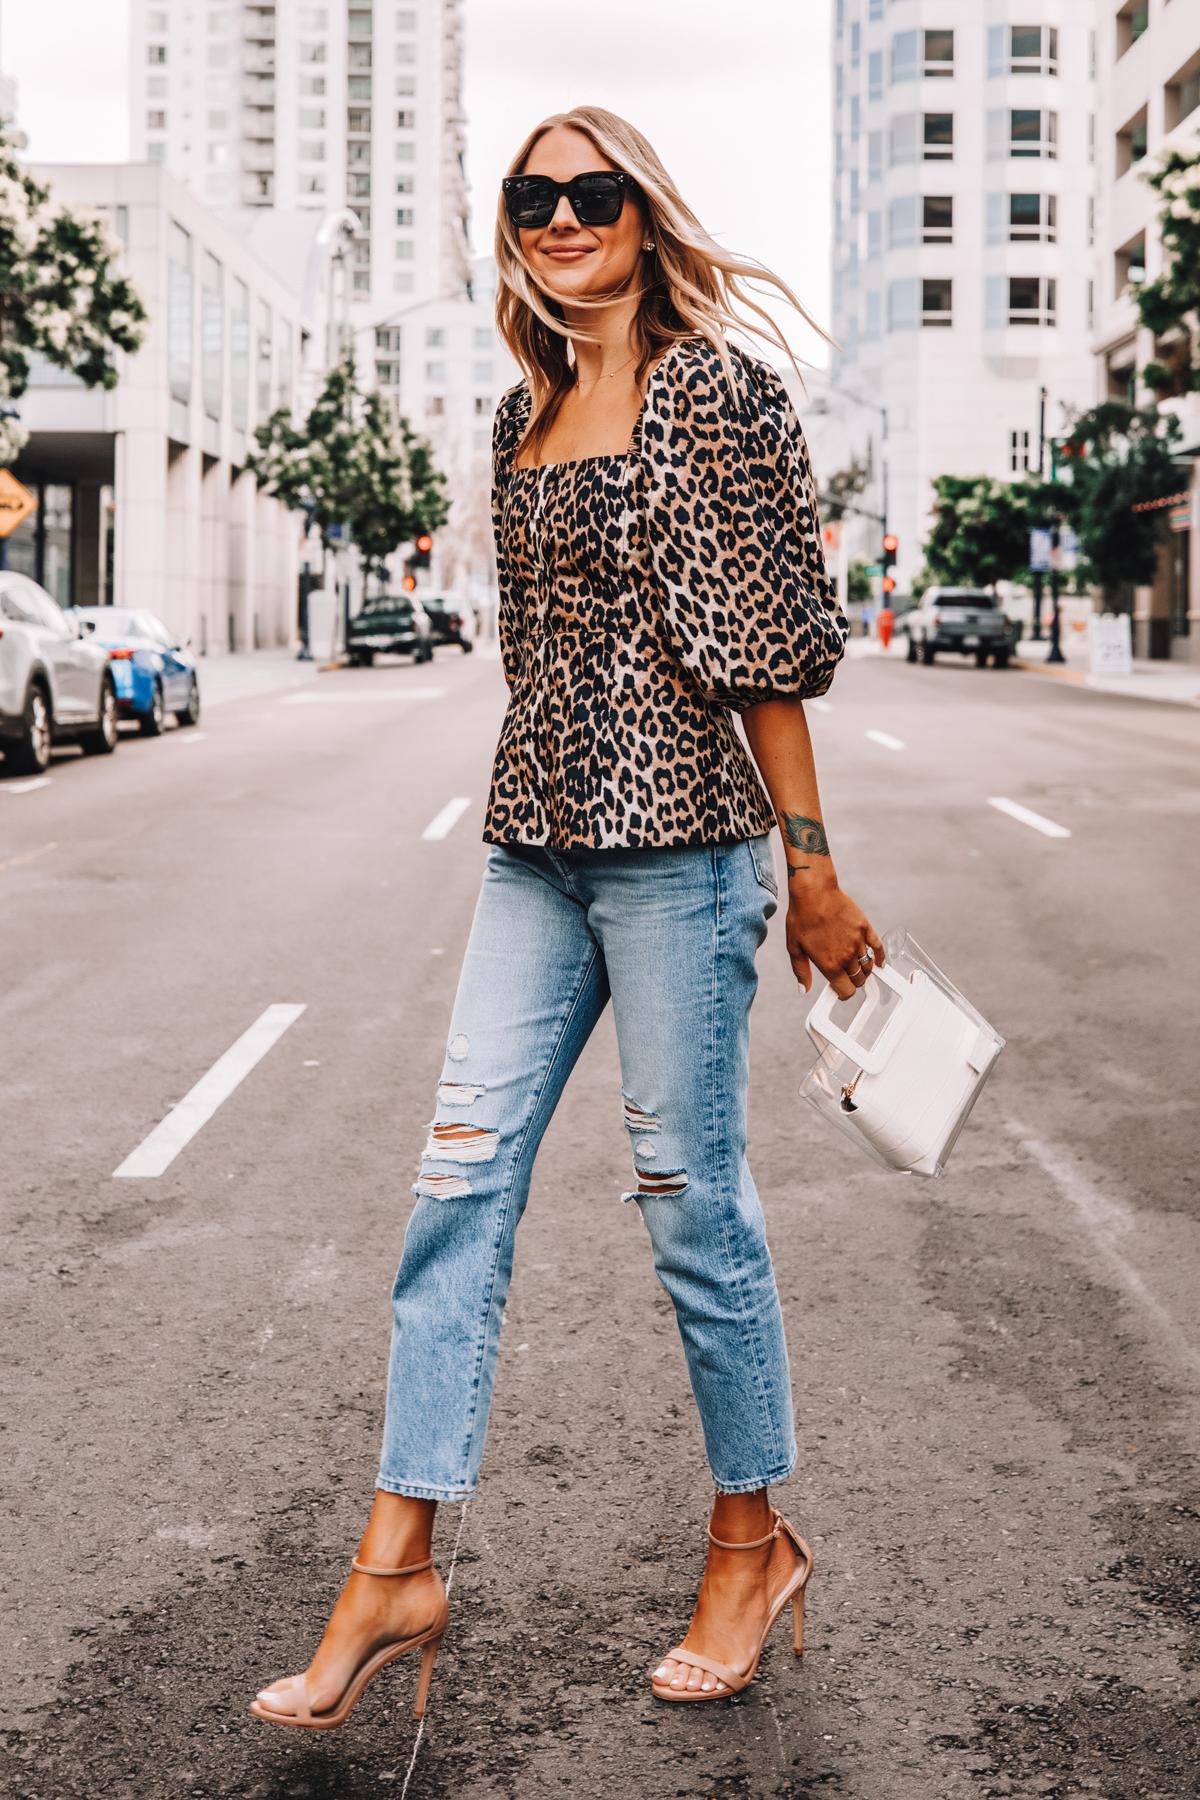 Fashion Jackson Wearing Ganni Leopard Top Frame Ripped Jeans Nude Heeled Sandals White Handbag Street Style